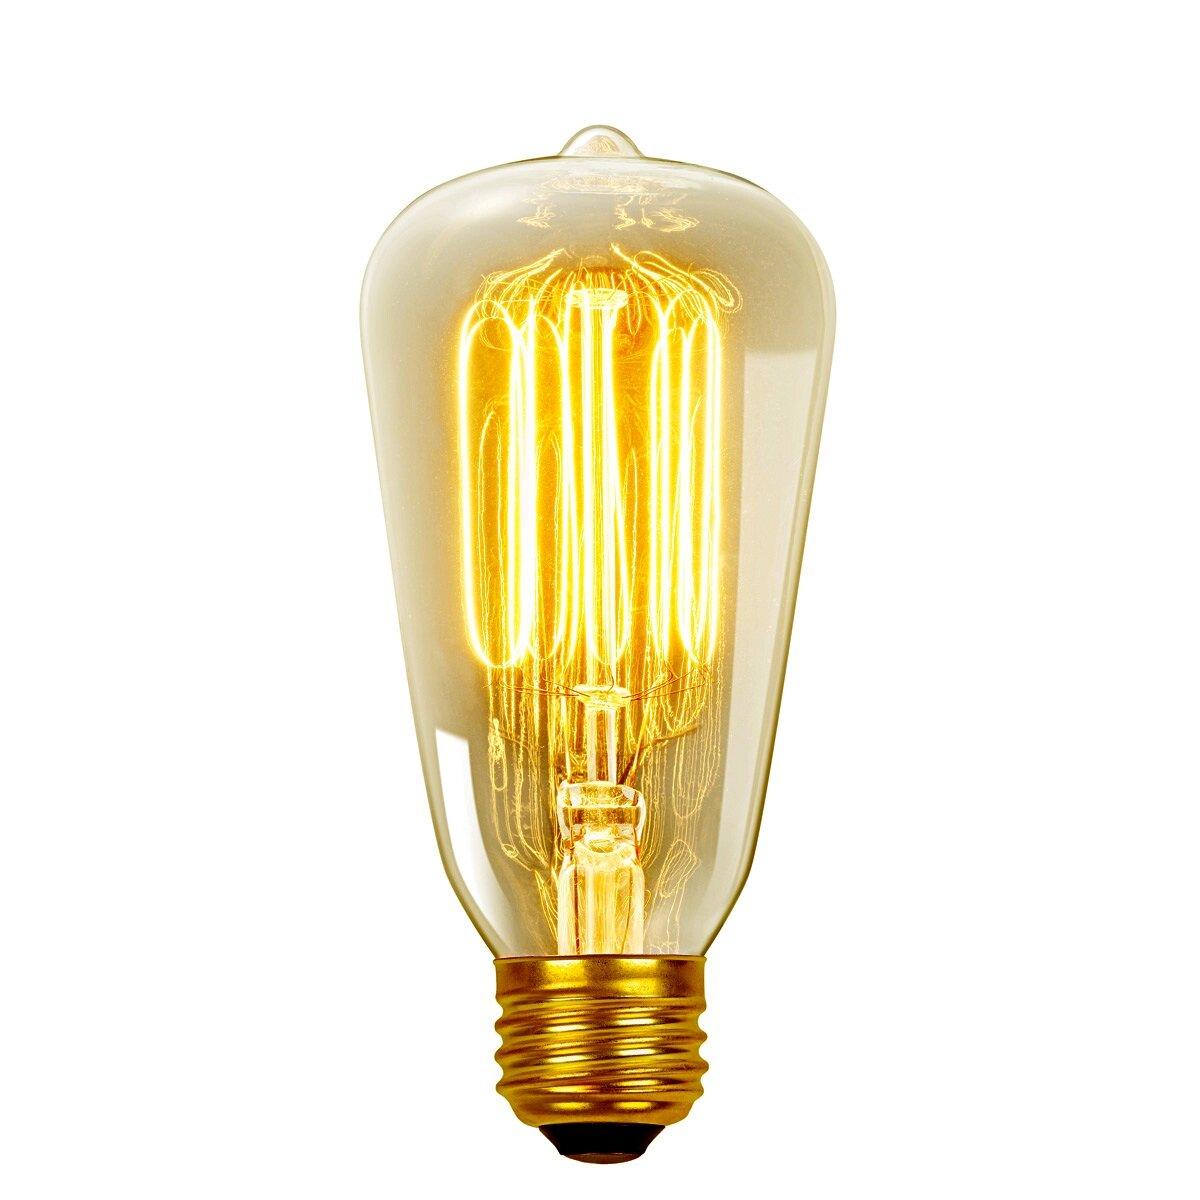 Globe Electric Company Vintage Edison 40 Watt 2700k S60 Squirrel Cage Incandescent Filament